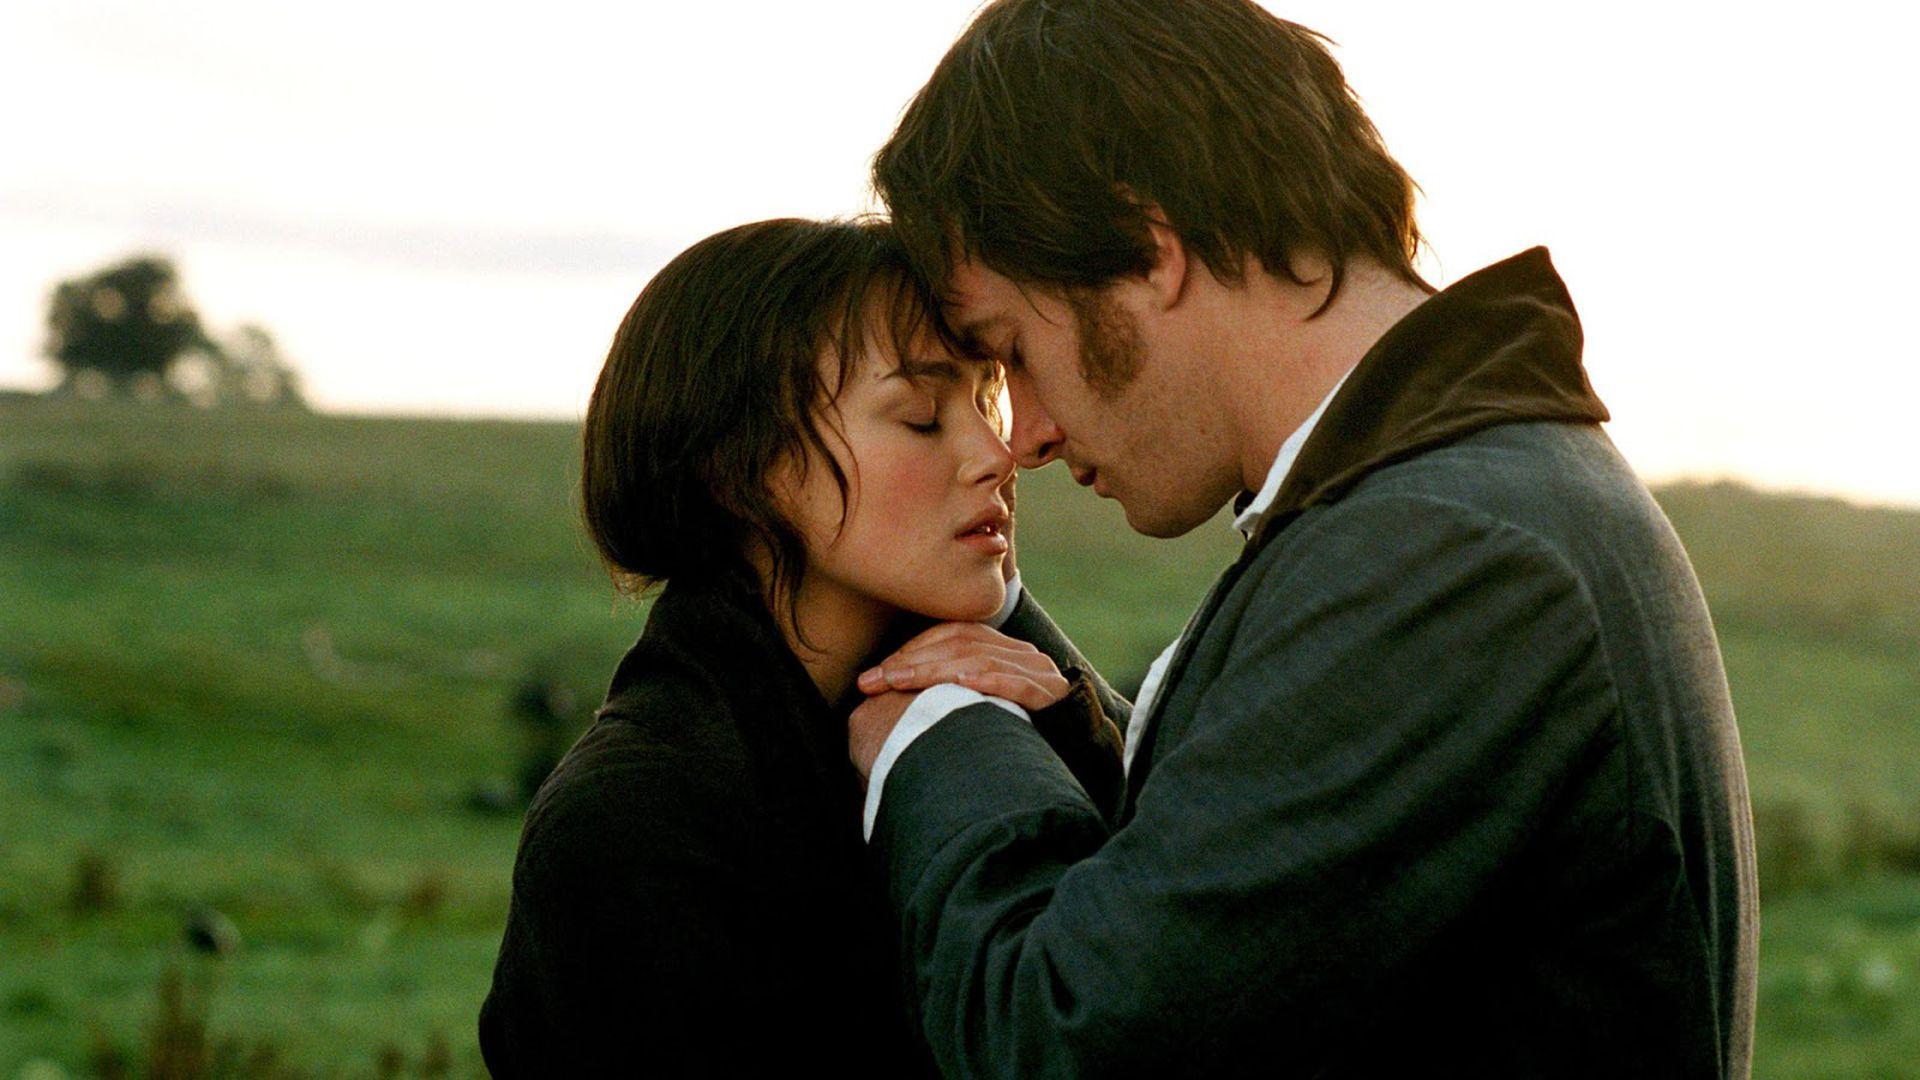 Lizzy Bennet y Fitzwilliam Darcy